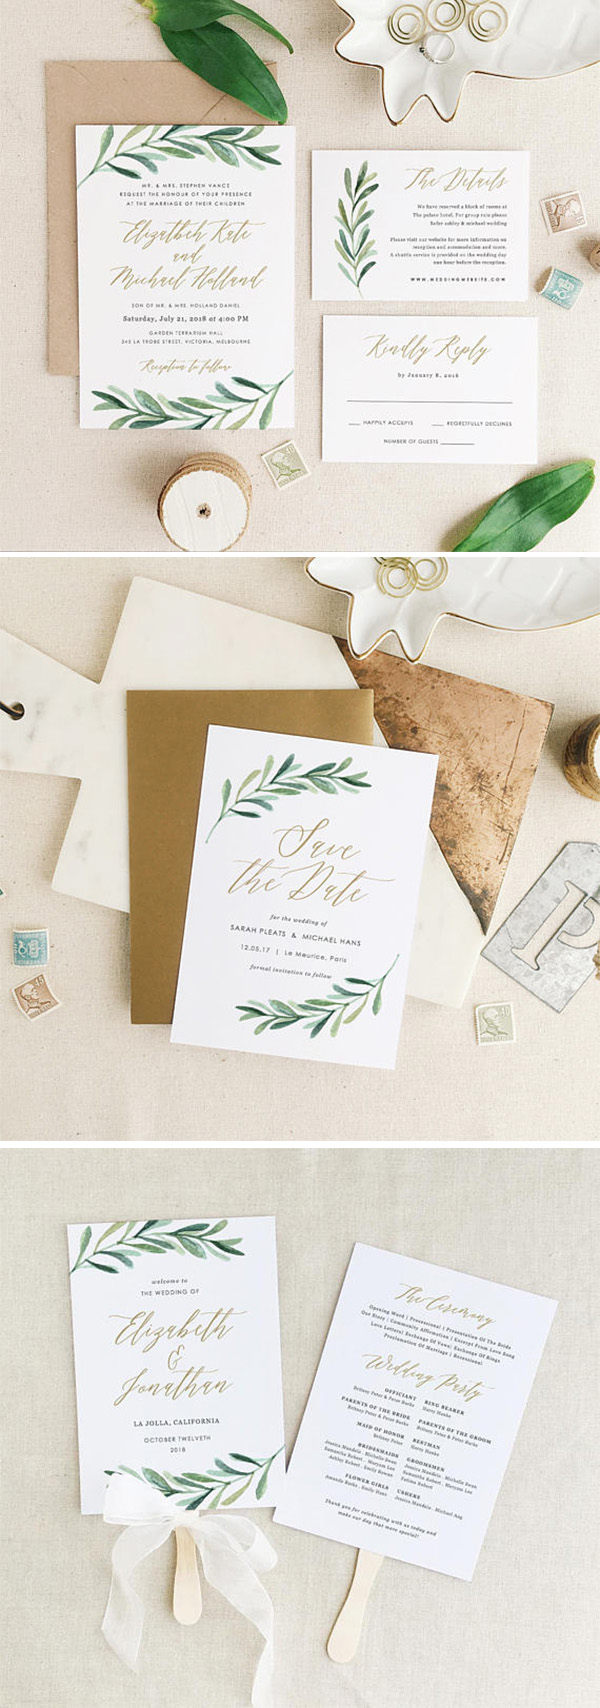 10 hot wedding invitation trends you